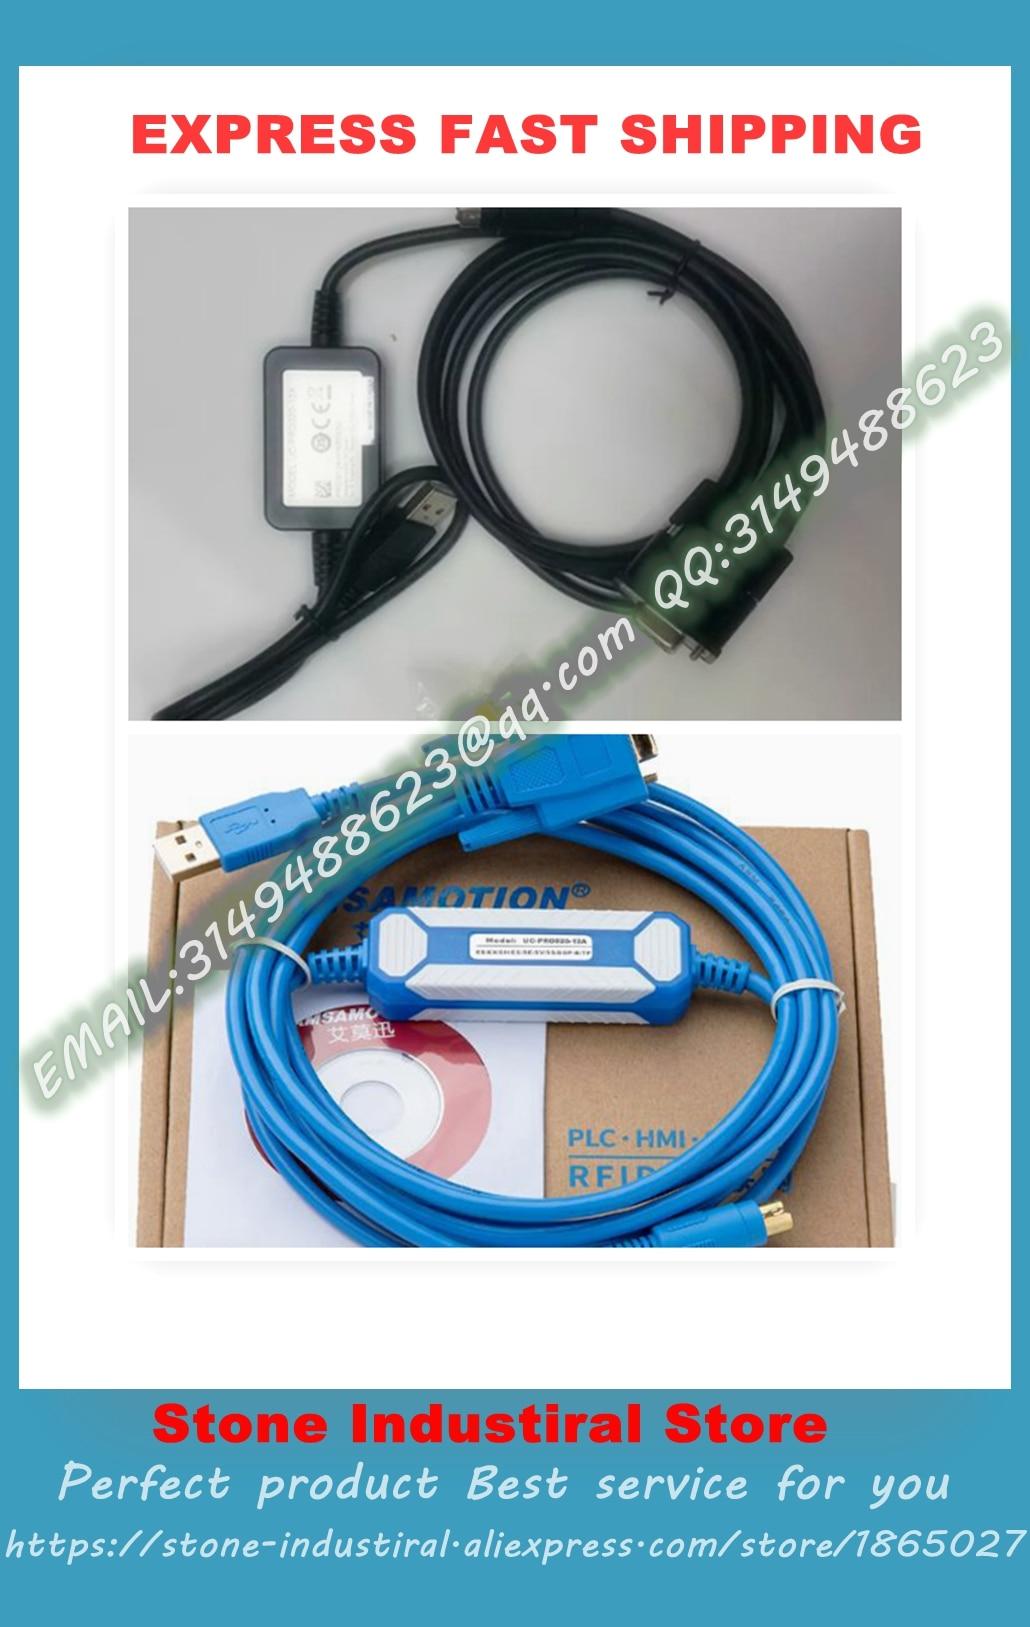 PLC تحميل كابل الاتصالات كابل برجمة تحويل المنفذ التسلسلي USB UC-PRG020-12A